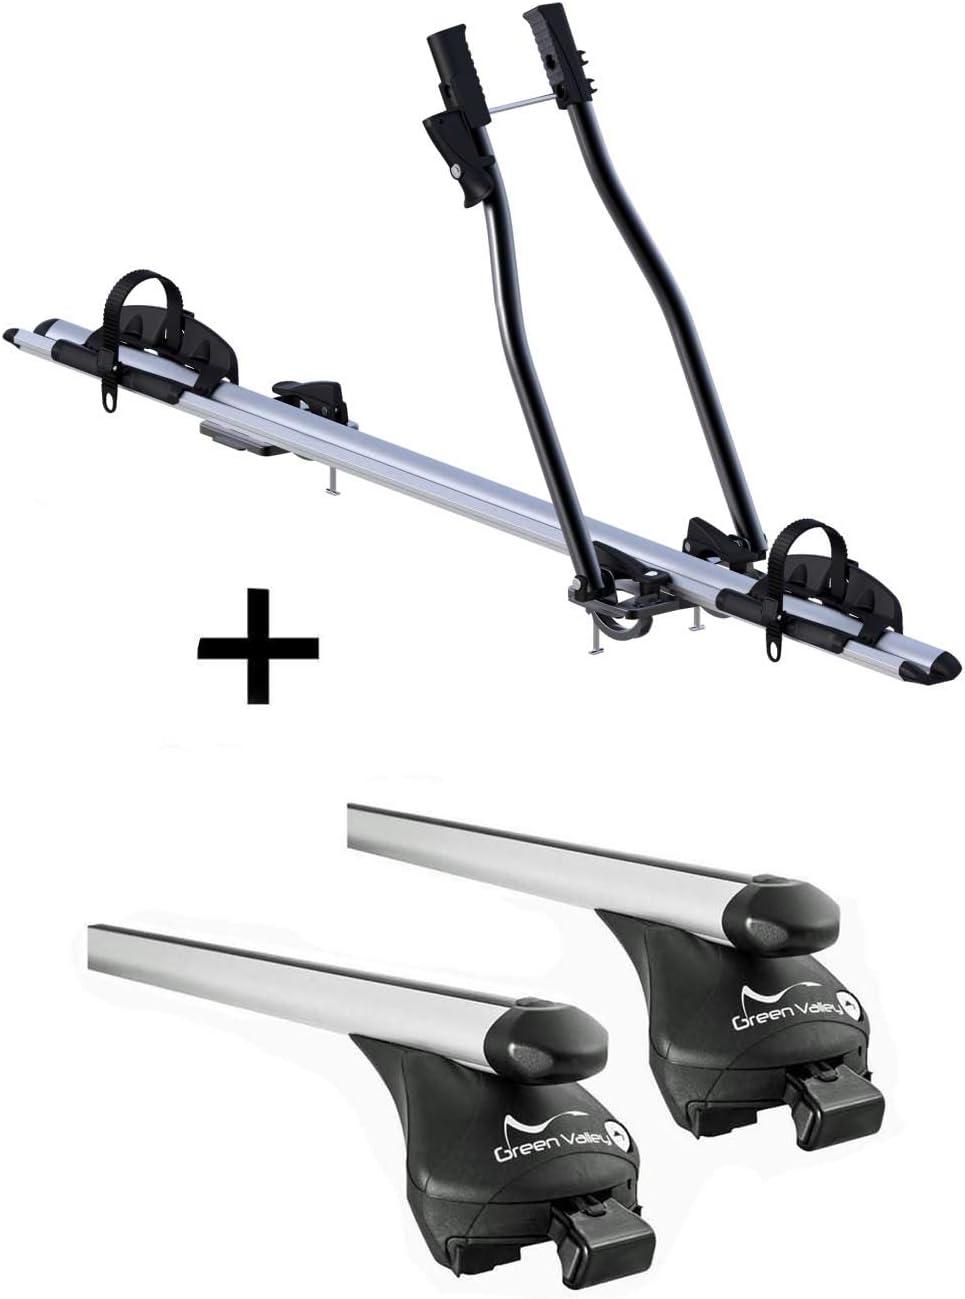 Vdp Fahrradträger Sagittar Relingträger Quick Xl Kompatibel Mit Ford Connect Grand Tourneo Ab 2014 Auto